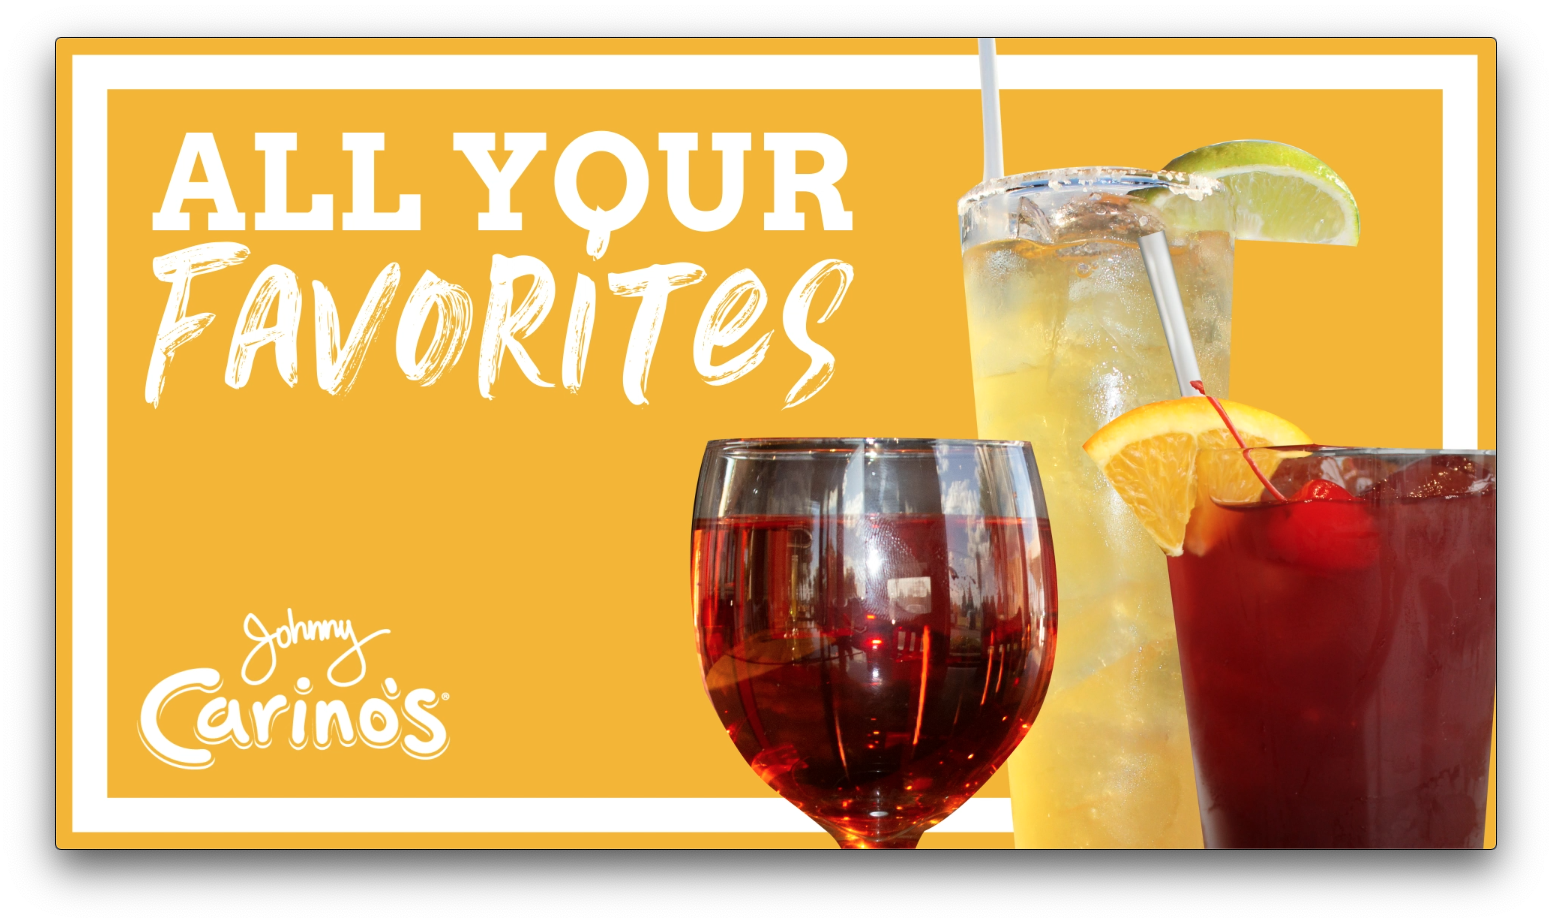 johnny carino's drinks motion graphic screenshot